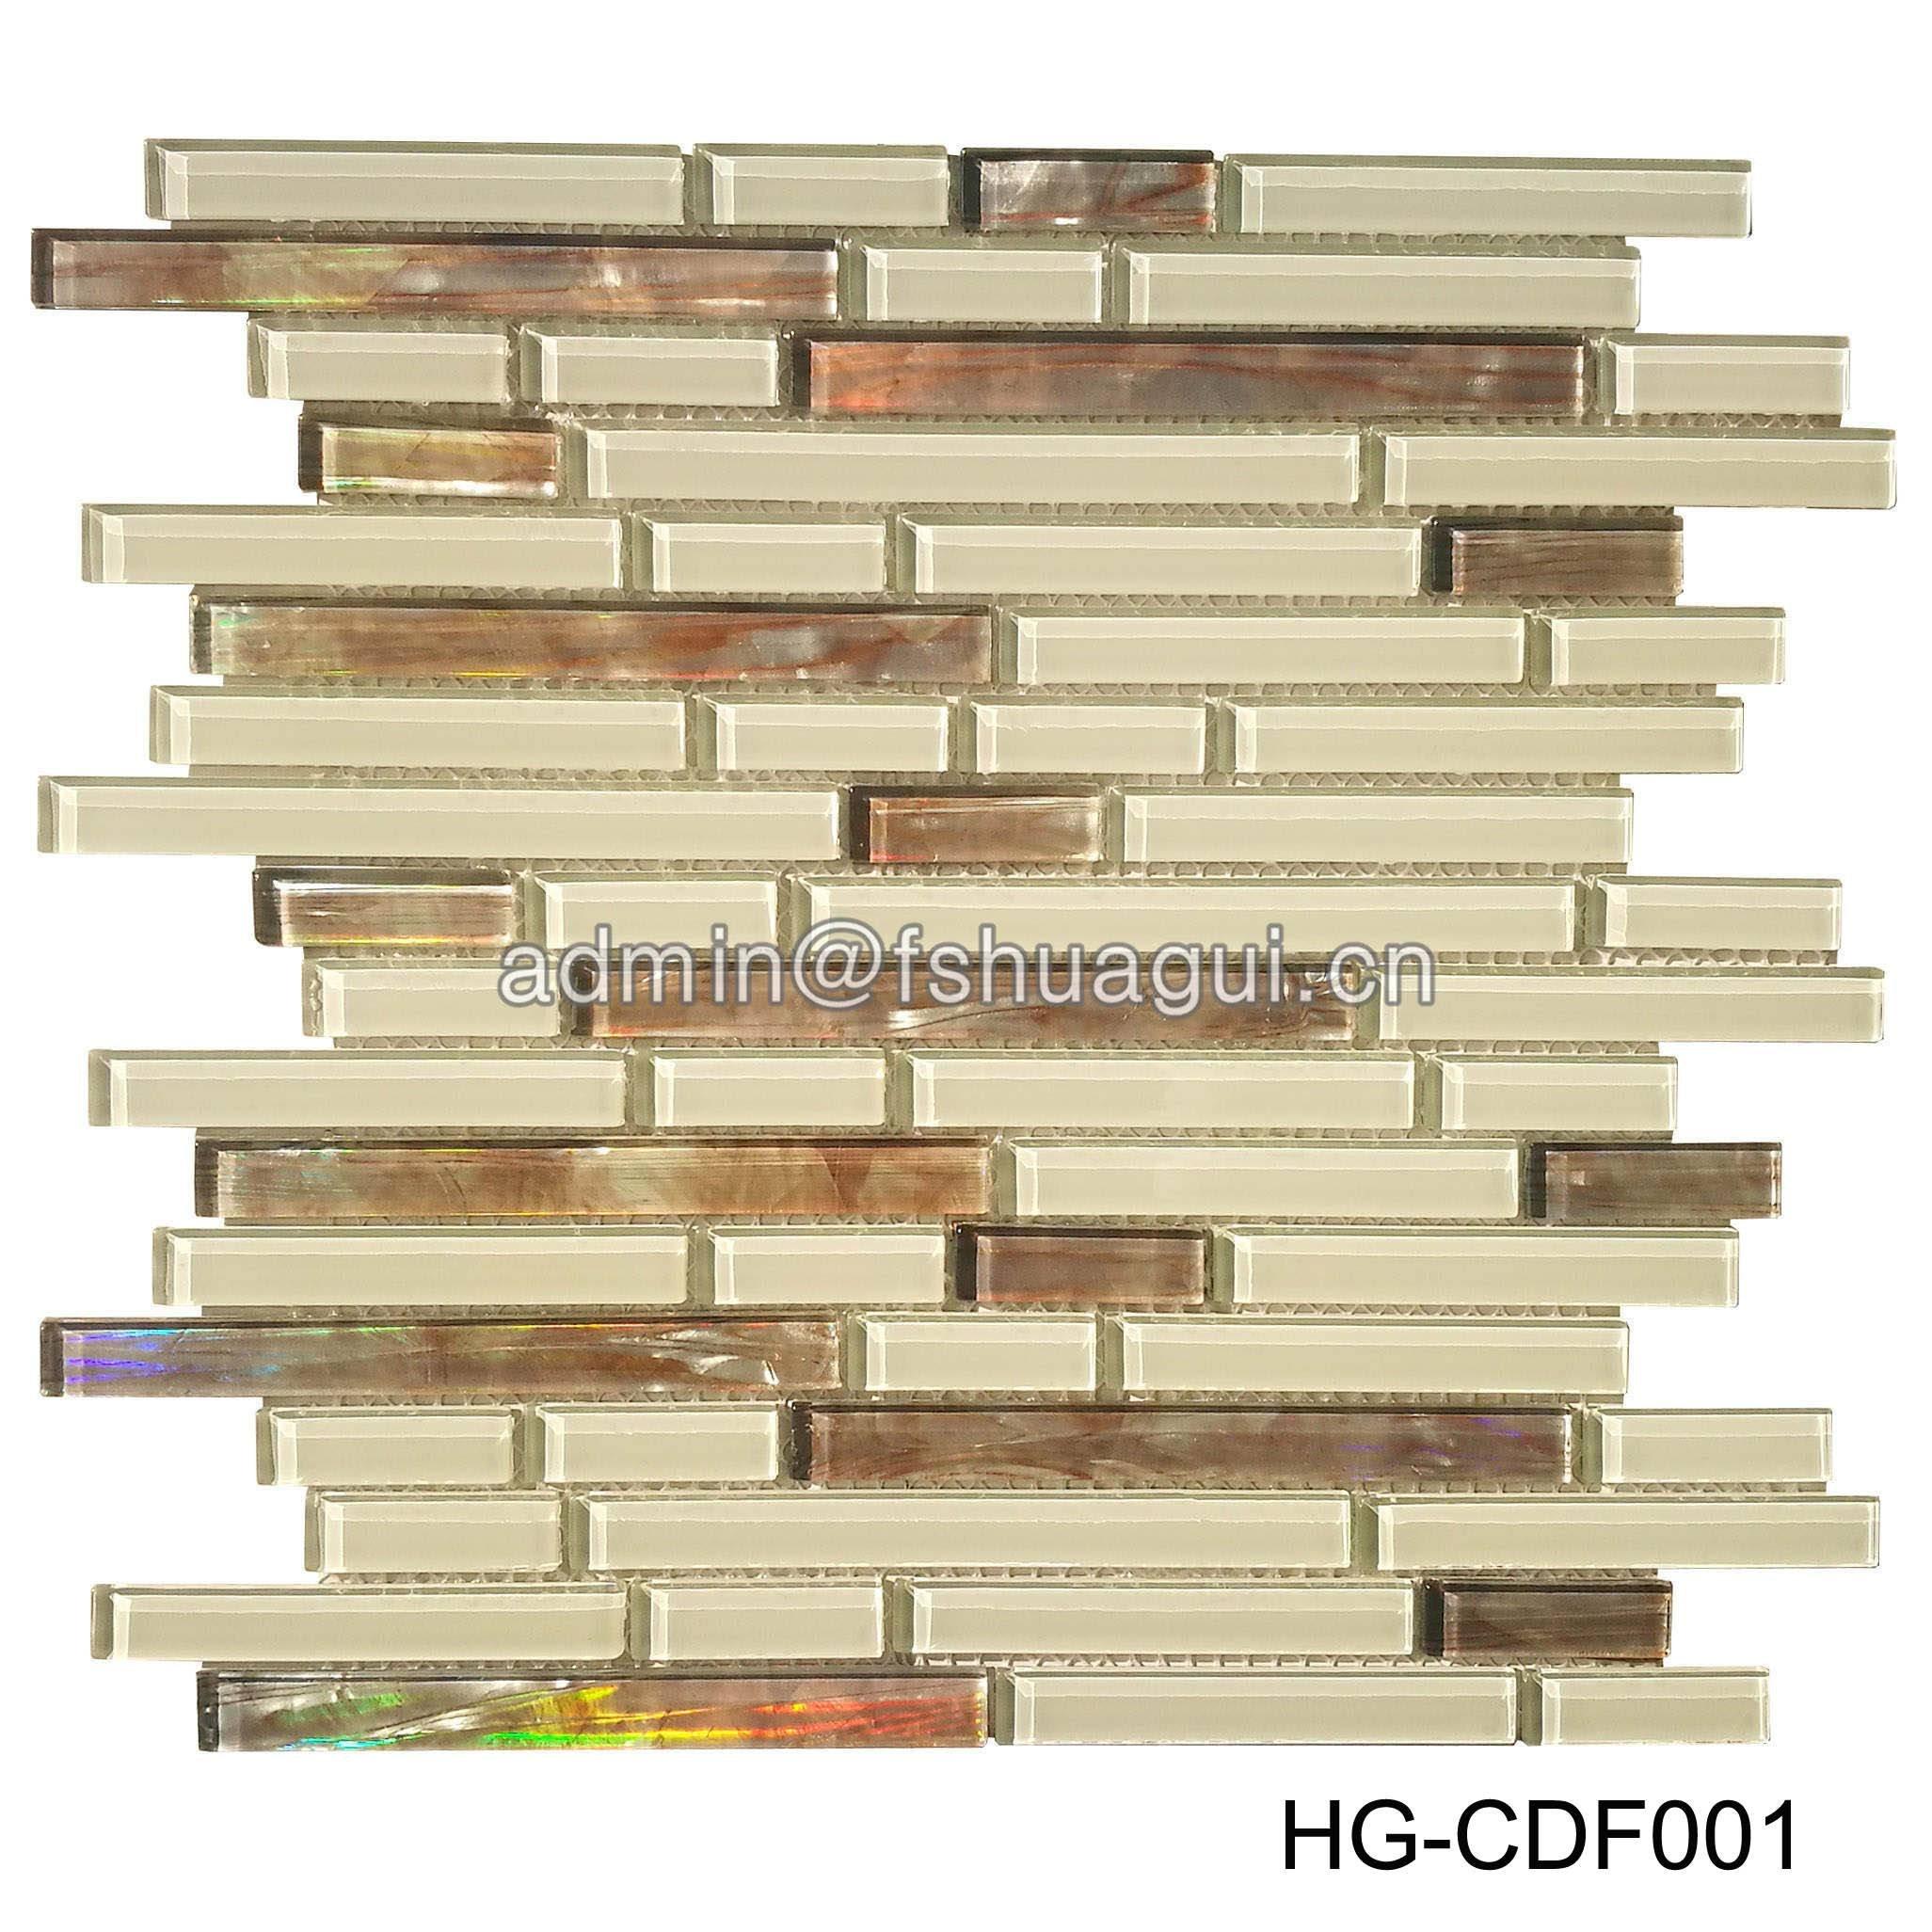 Huagui Glass Mosaic Tile HG-CDF001 GLASS MOSAIC TILE image31